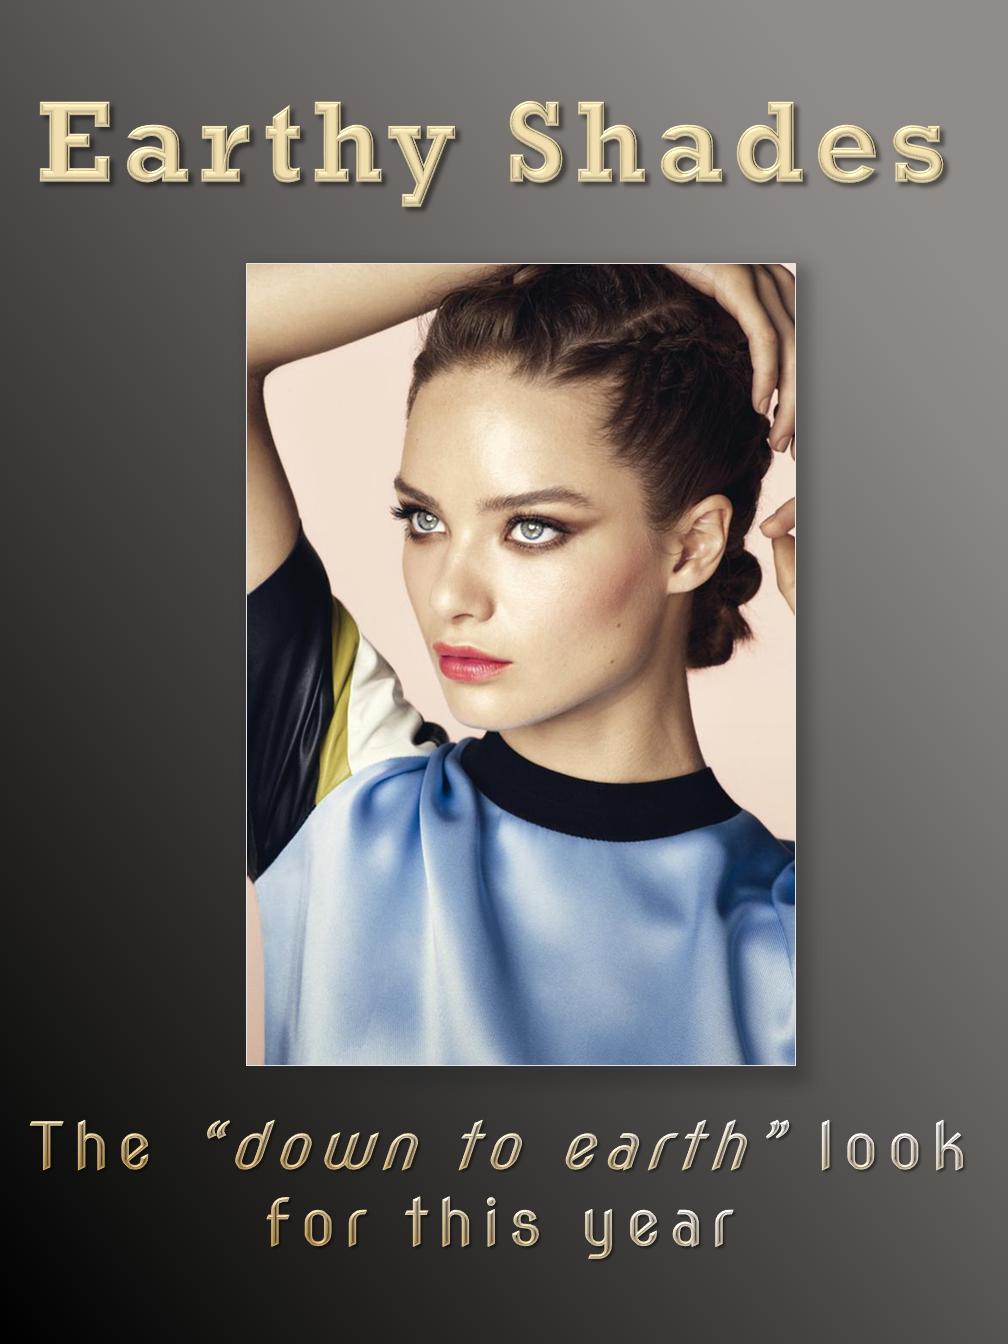 Earthy Shades